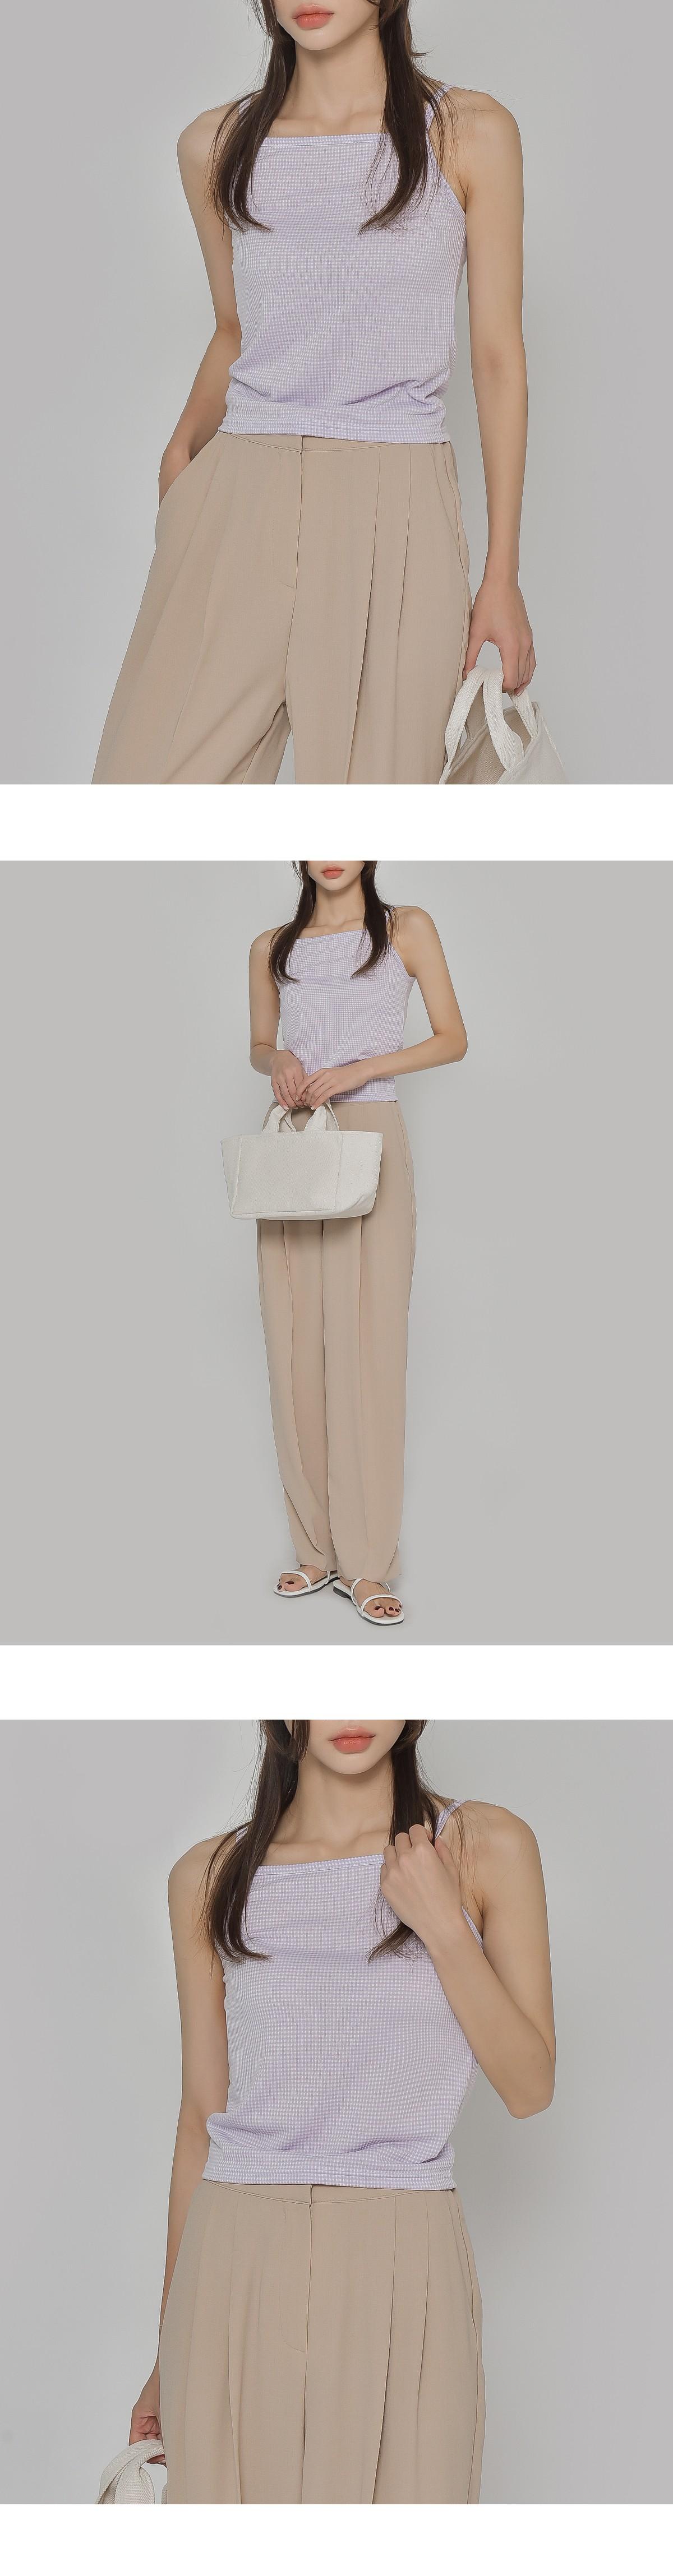 ♥1+1♥ picnic sleeveless